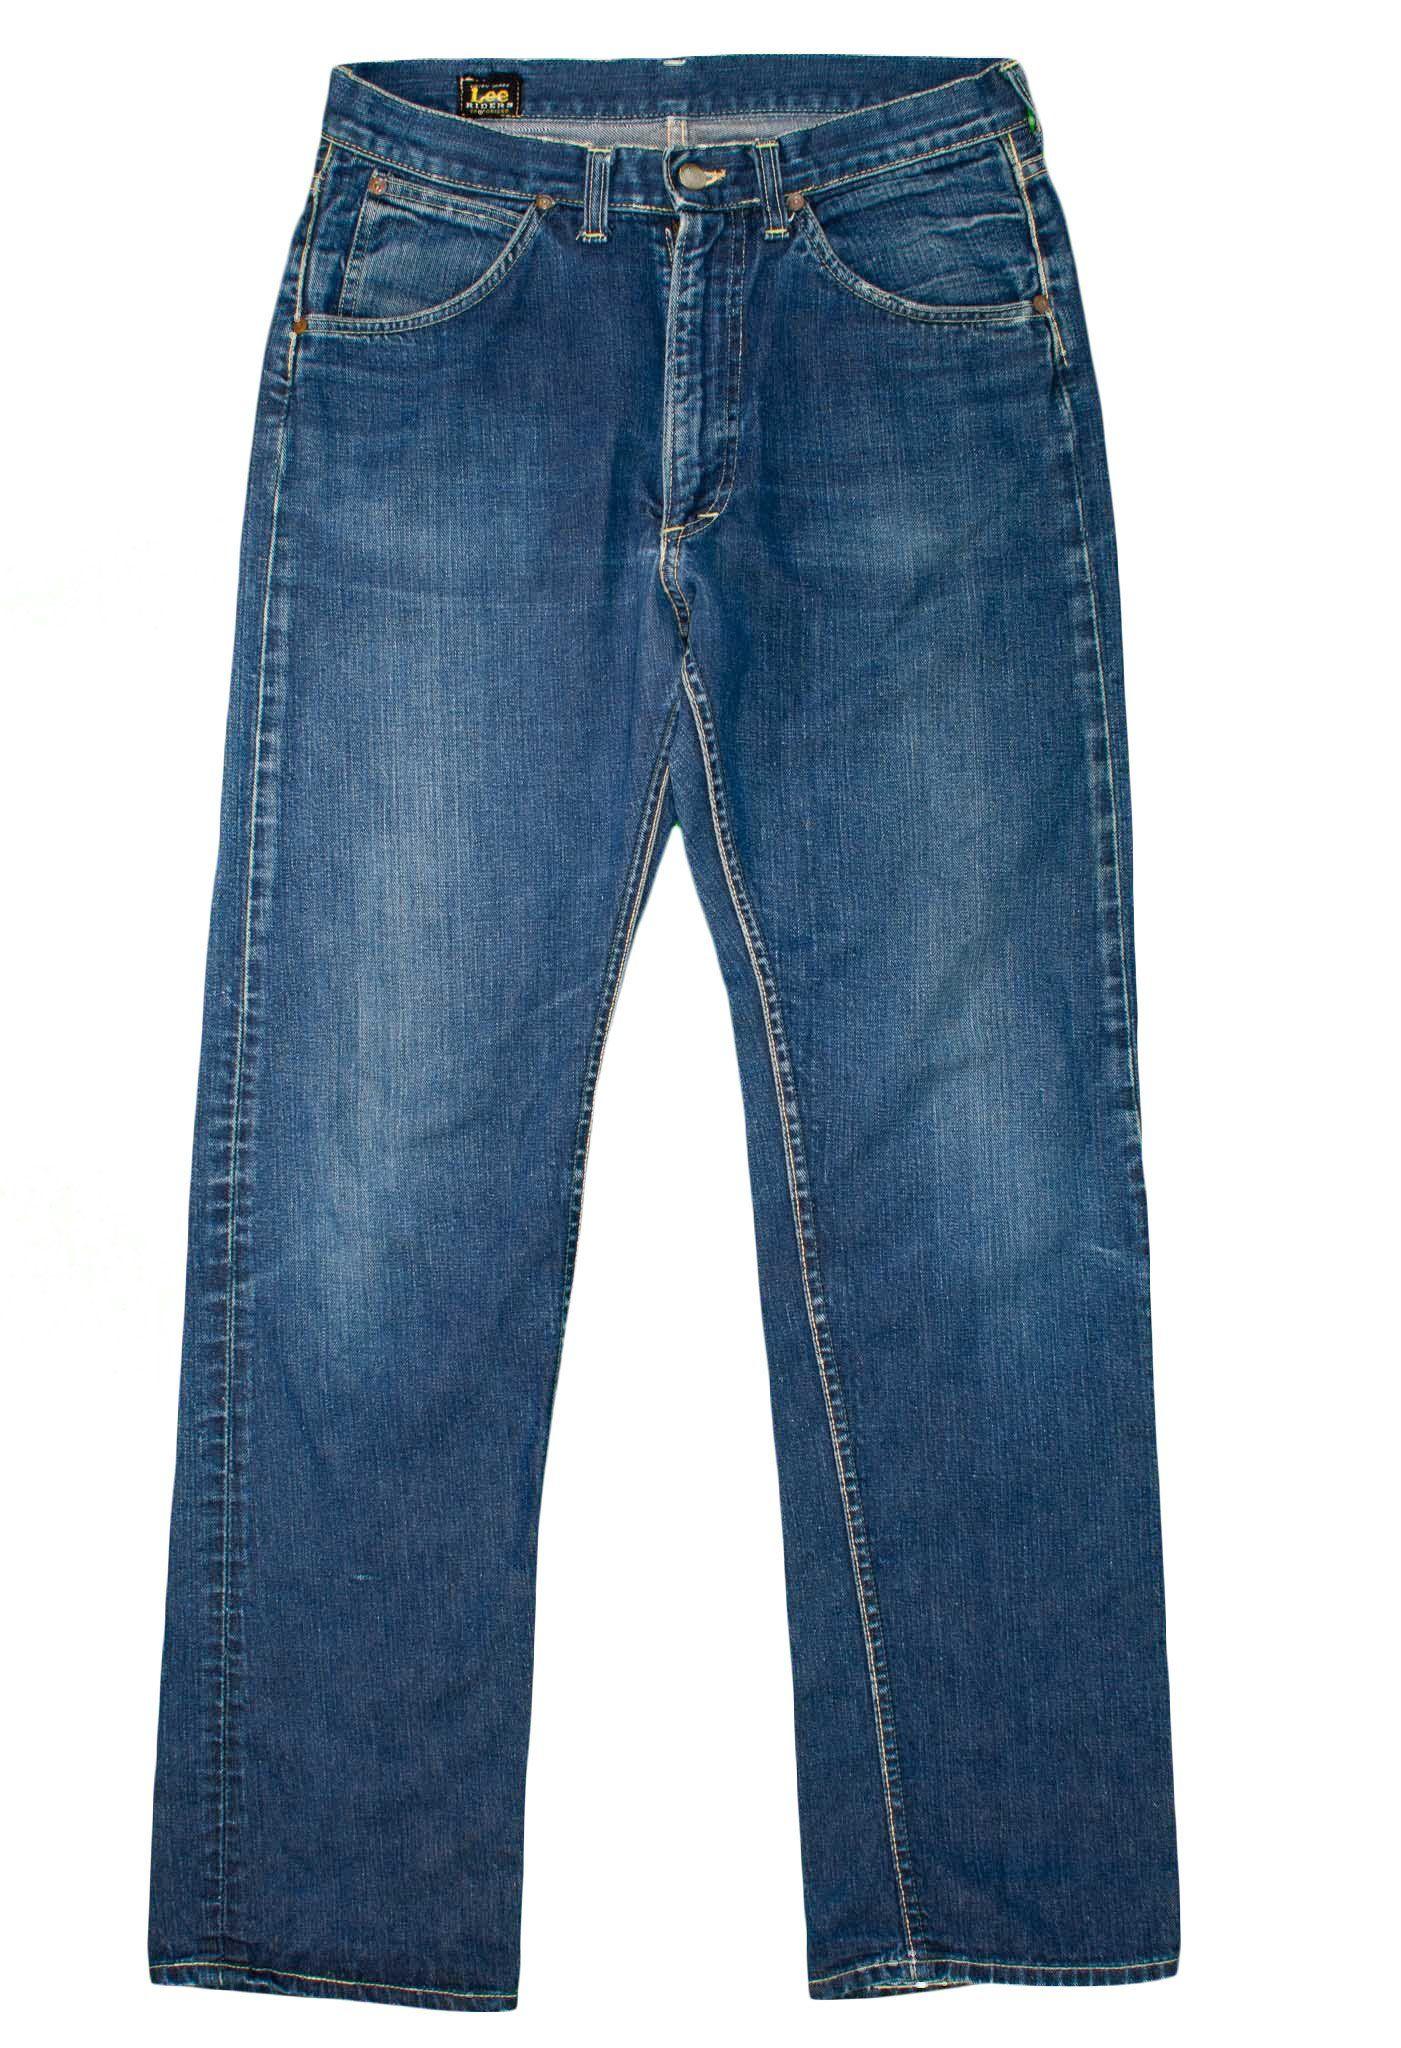 5fd2f1d9 Union Made Sanforized 101 Lee Riders Men's Jeans 30x32 Vintage Denim 101 –  itisvintage #1950s #50s #50sfashion #itisvintage #menswear #mensstyle ...